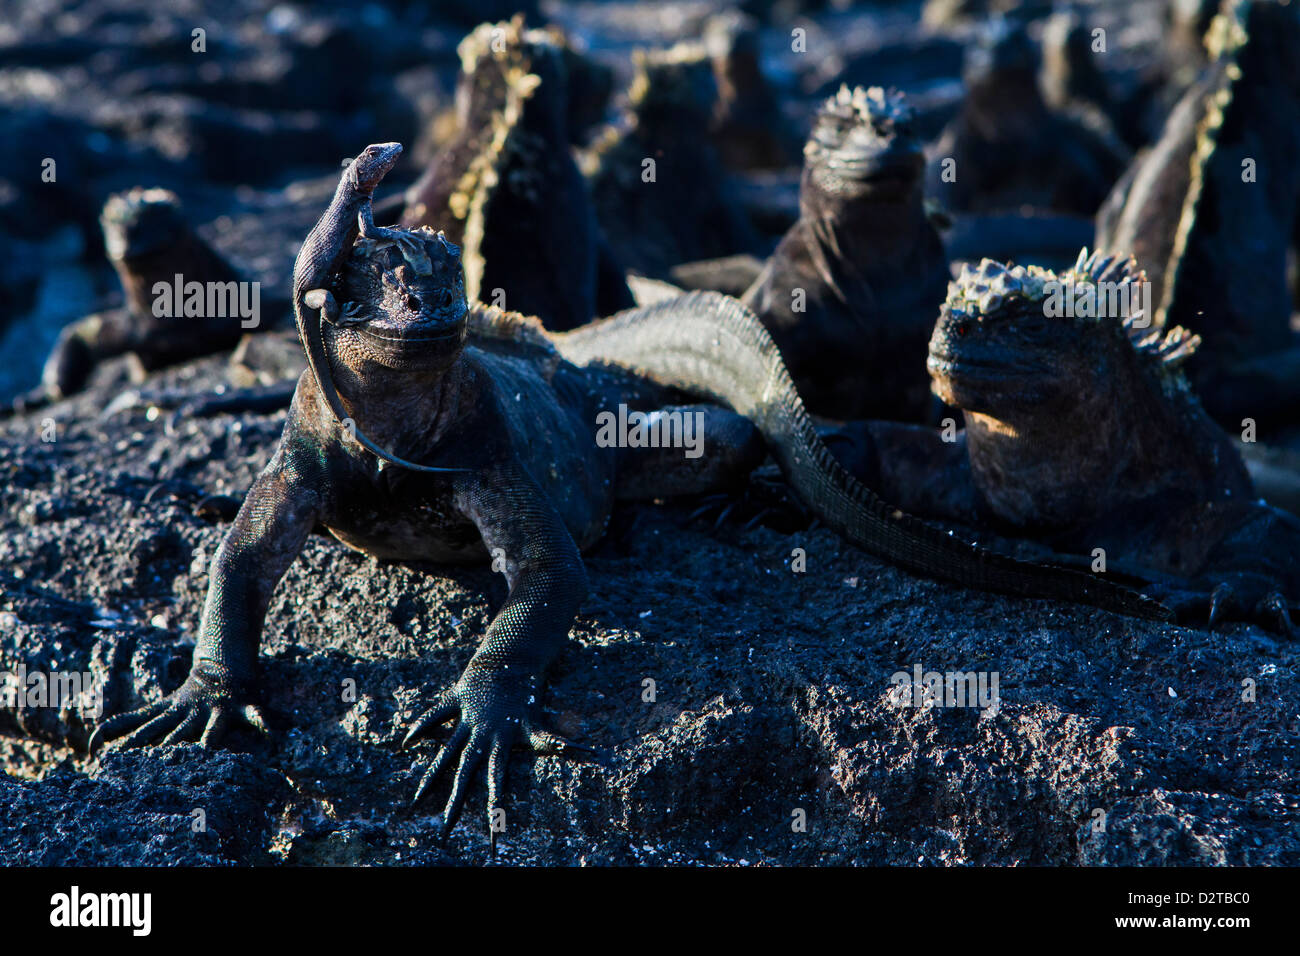 Galapagos marine iguanas (Amblyrhynchus cristatus), Fernandina Island, Galapagos Islands, Ecuador - Stock Image